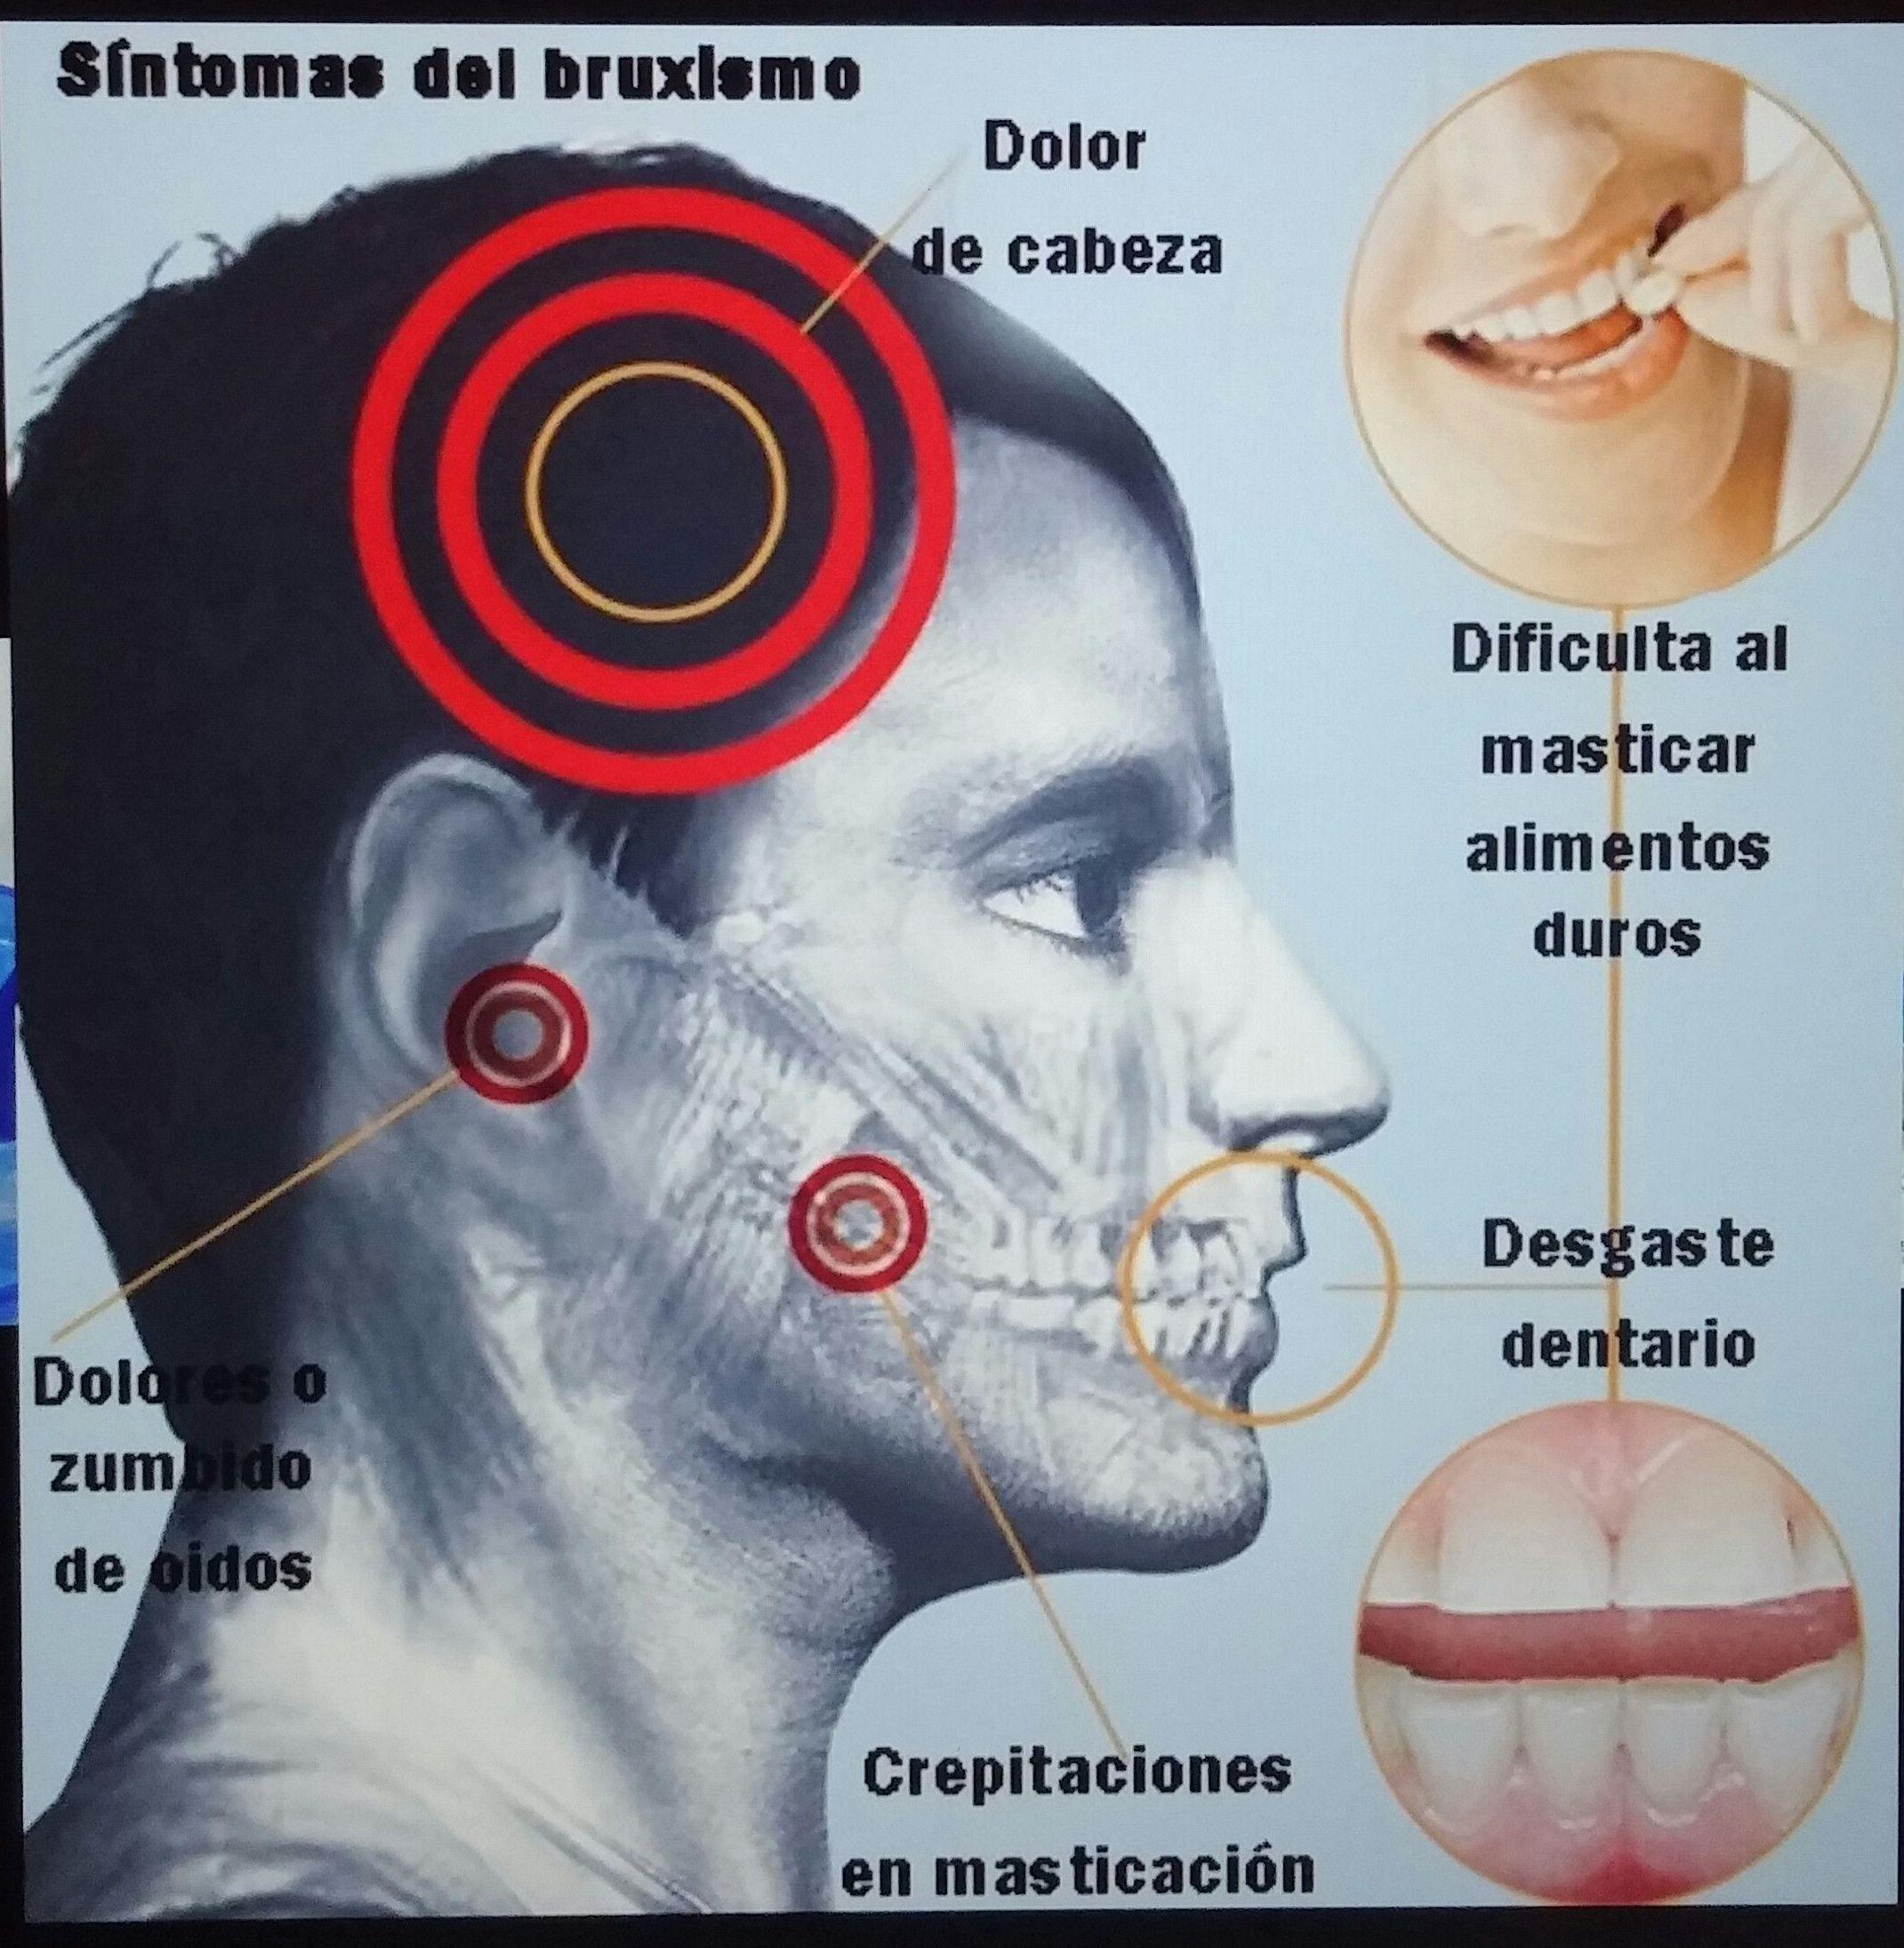 Foto 15 de Clínica dental en Solsona | Vila Dental Dra. Sonia Molina